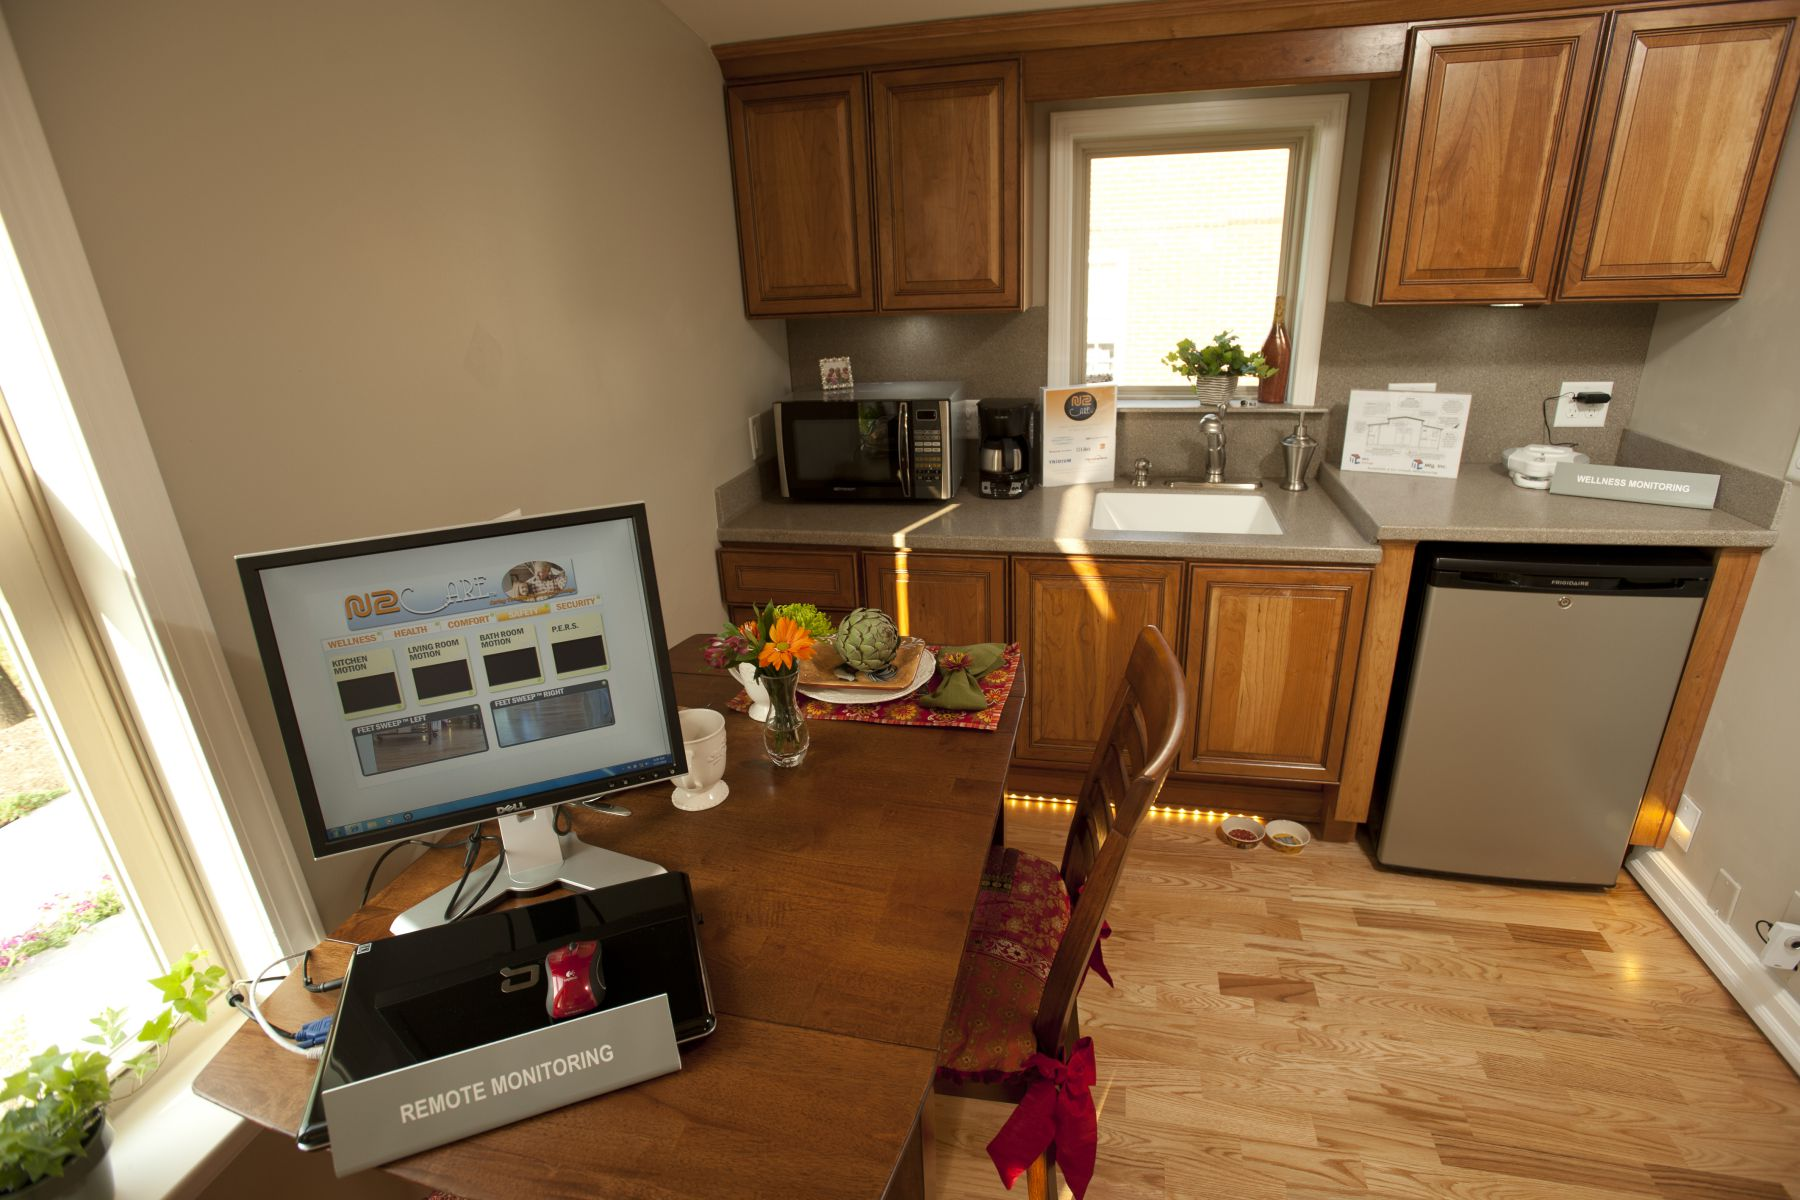 Una cocina moderna